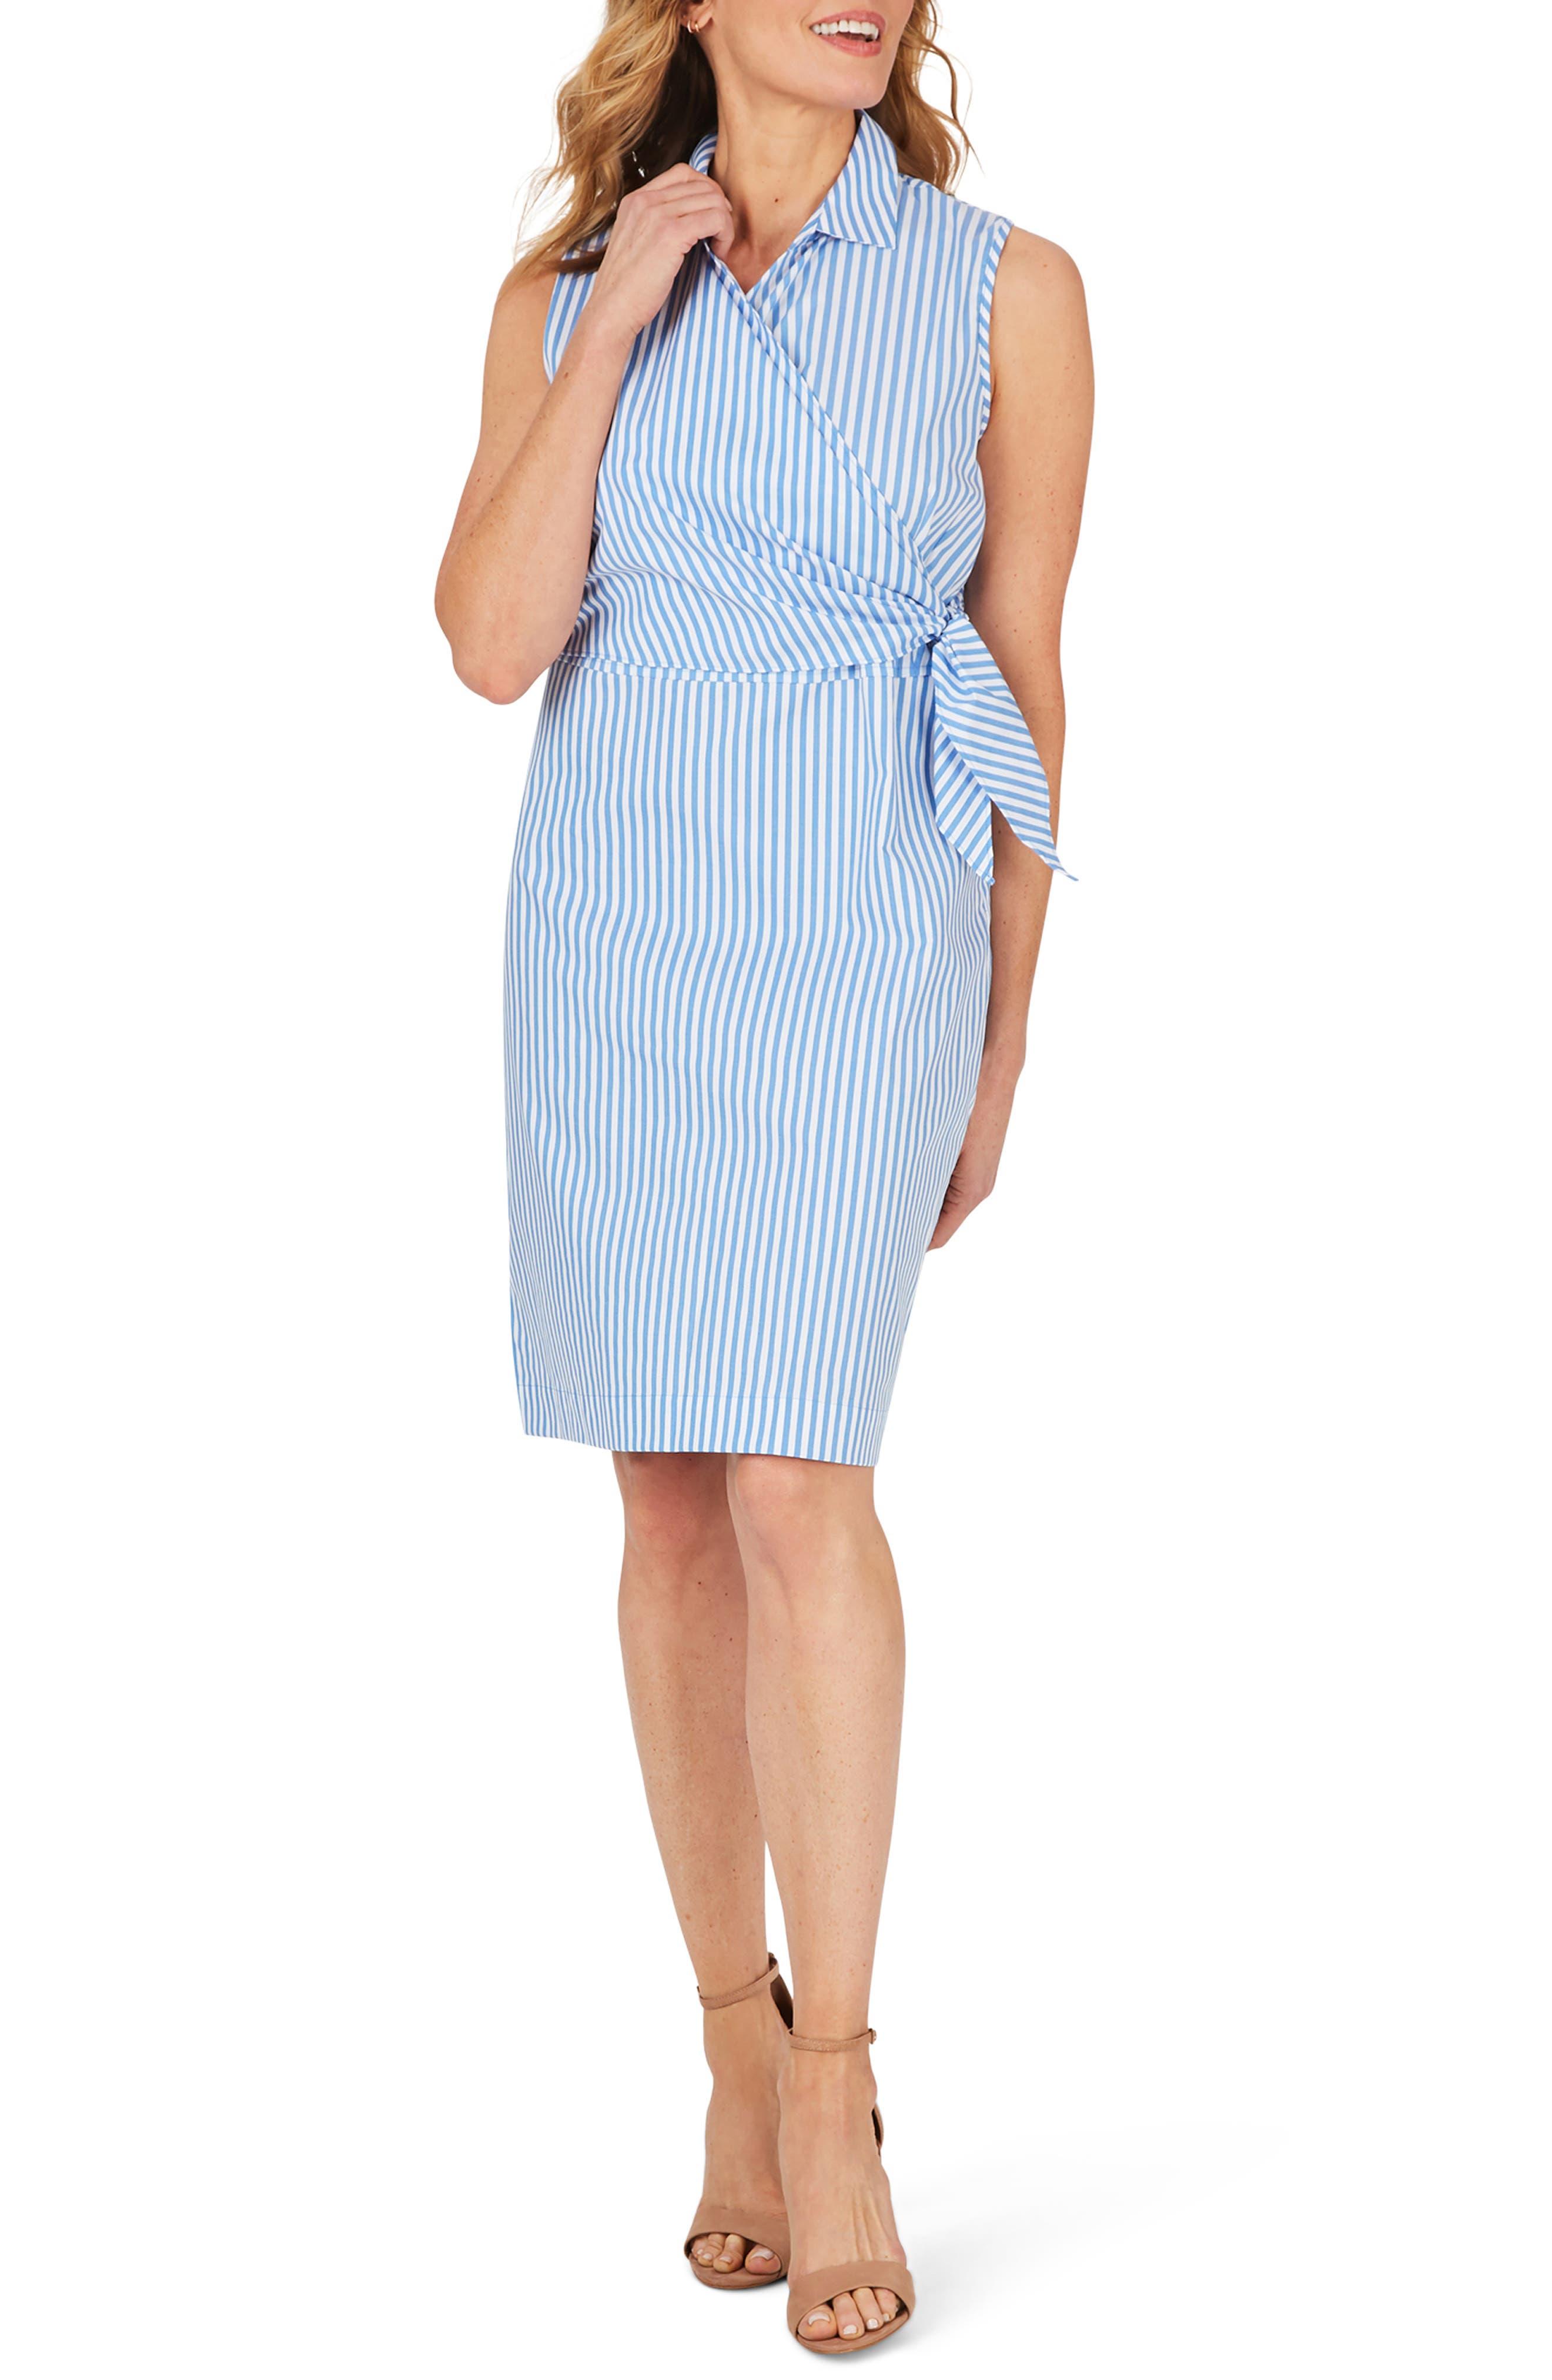 Capri Twill Stripe Faux Wrap Dress